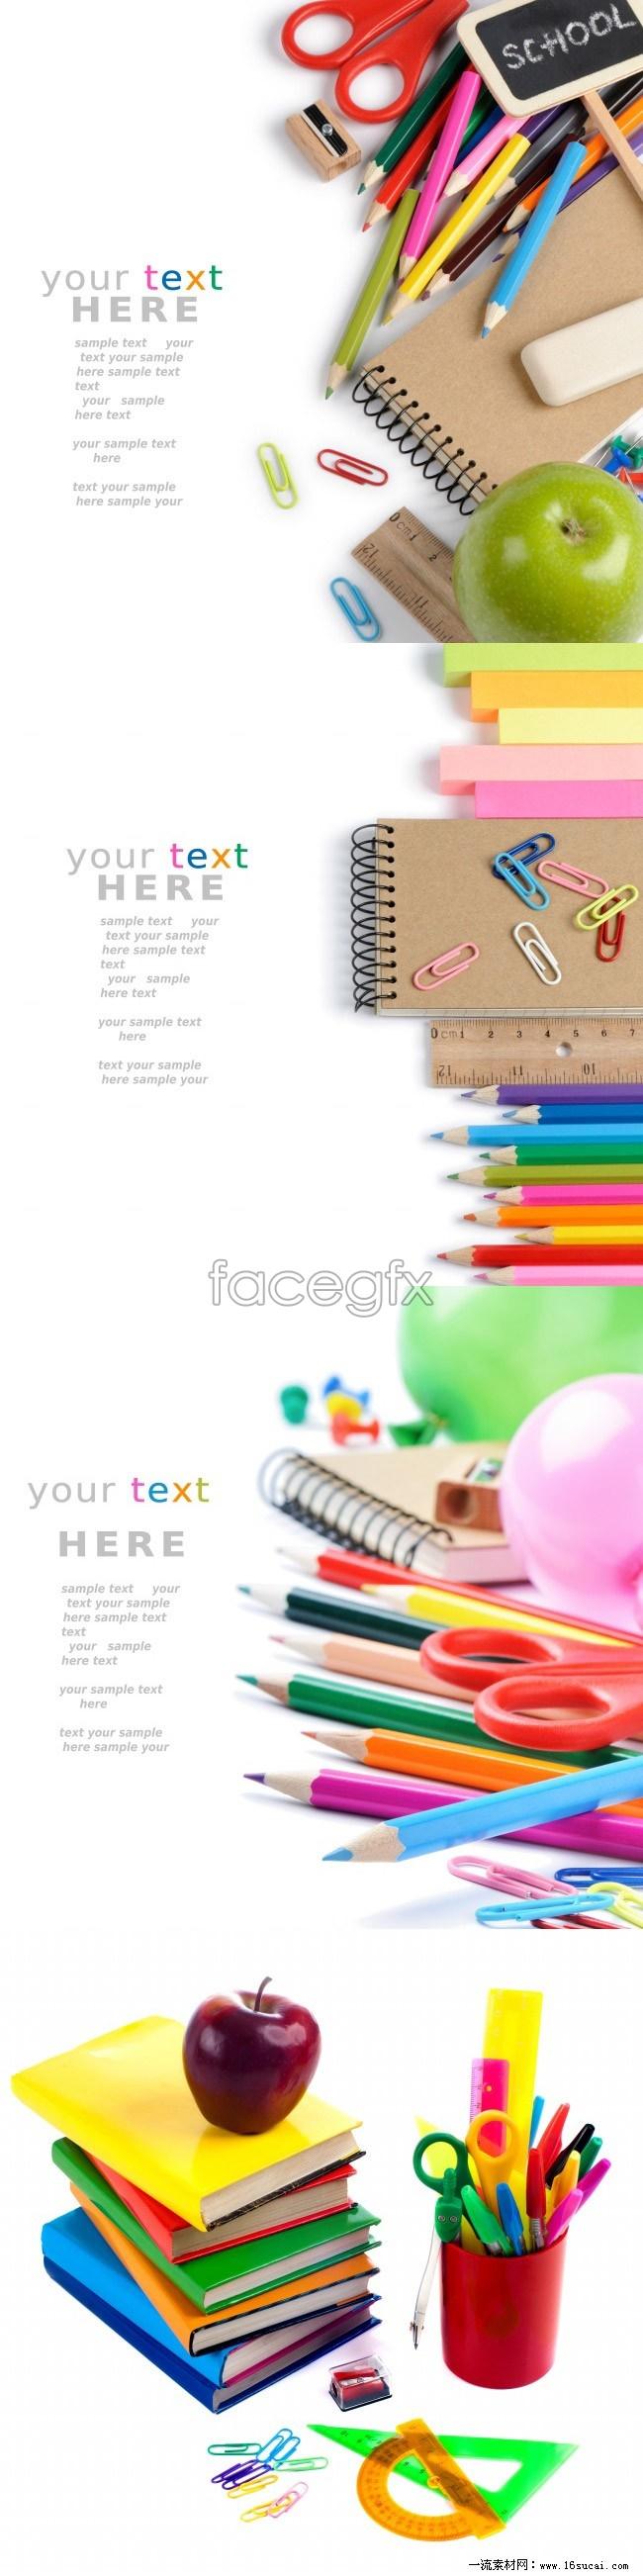 4 school supplies picture